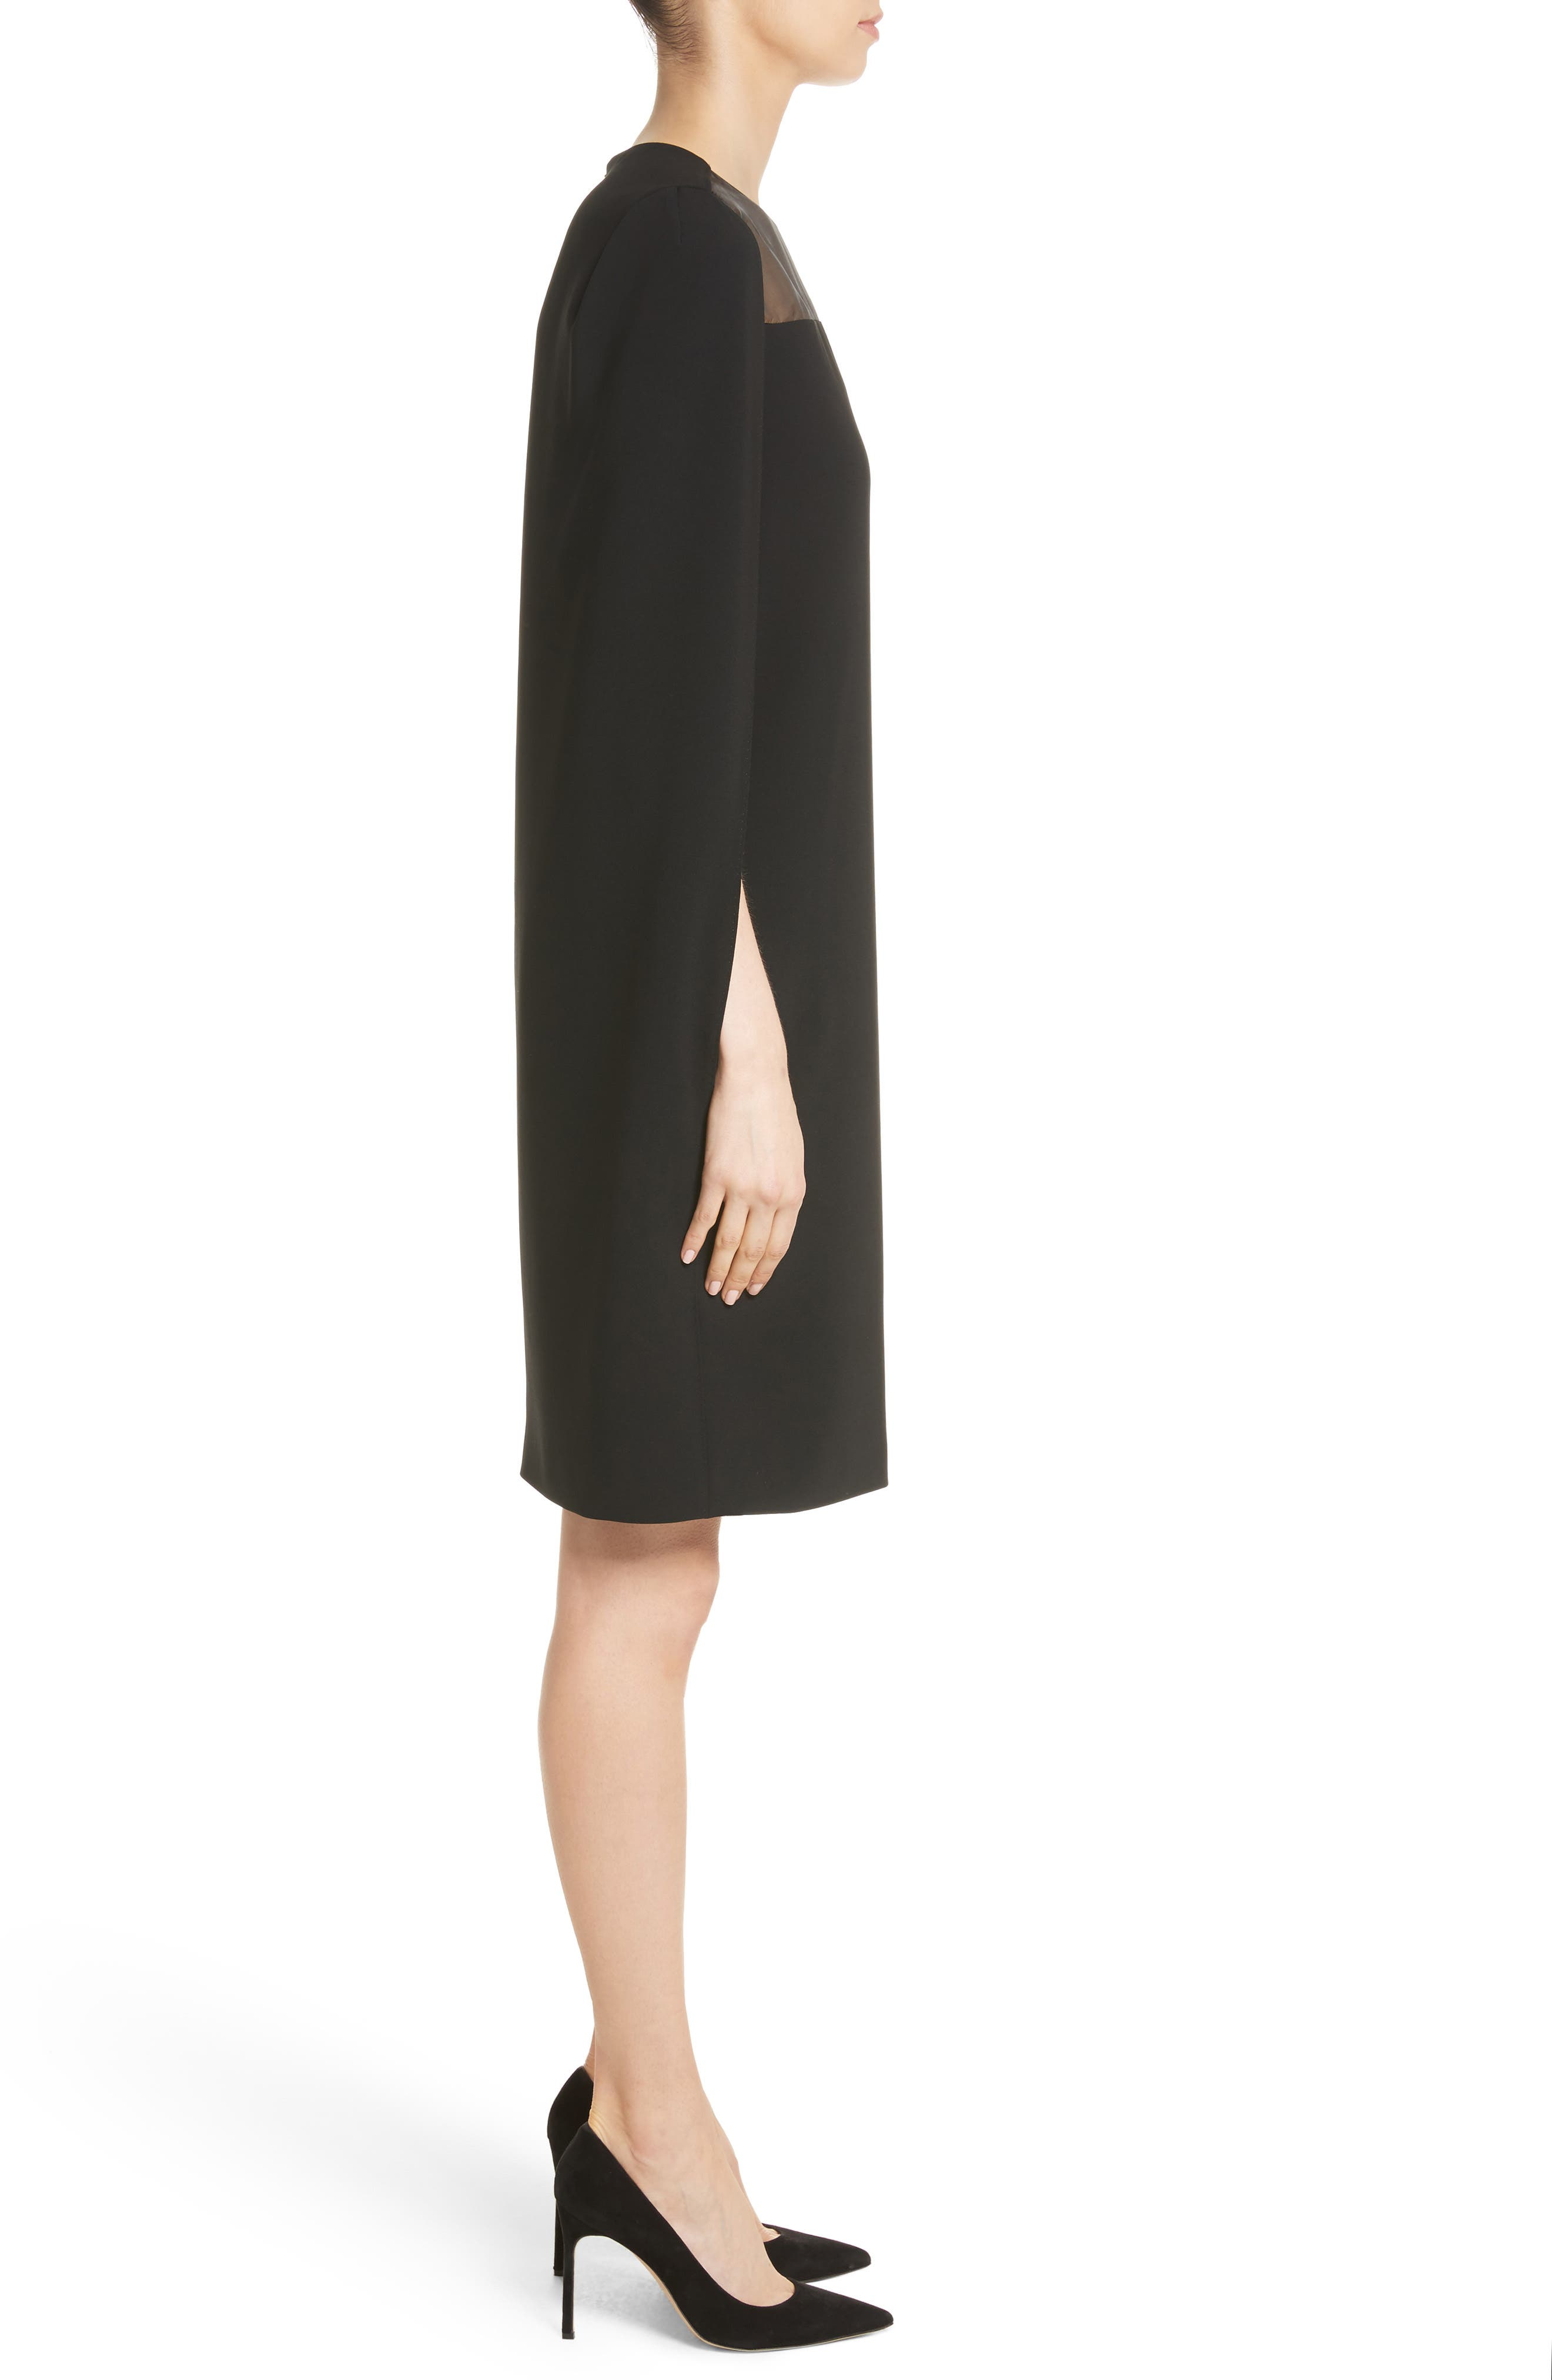 Sospiro Cape Shift Dress,                             Alternate thumbnail 3, color,                             Black